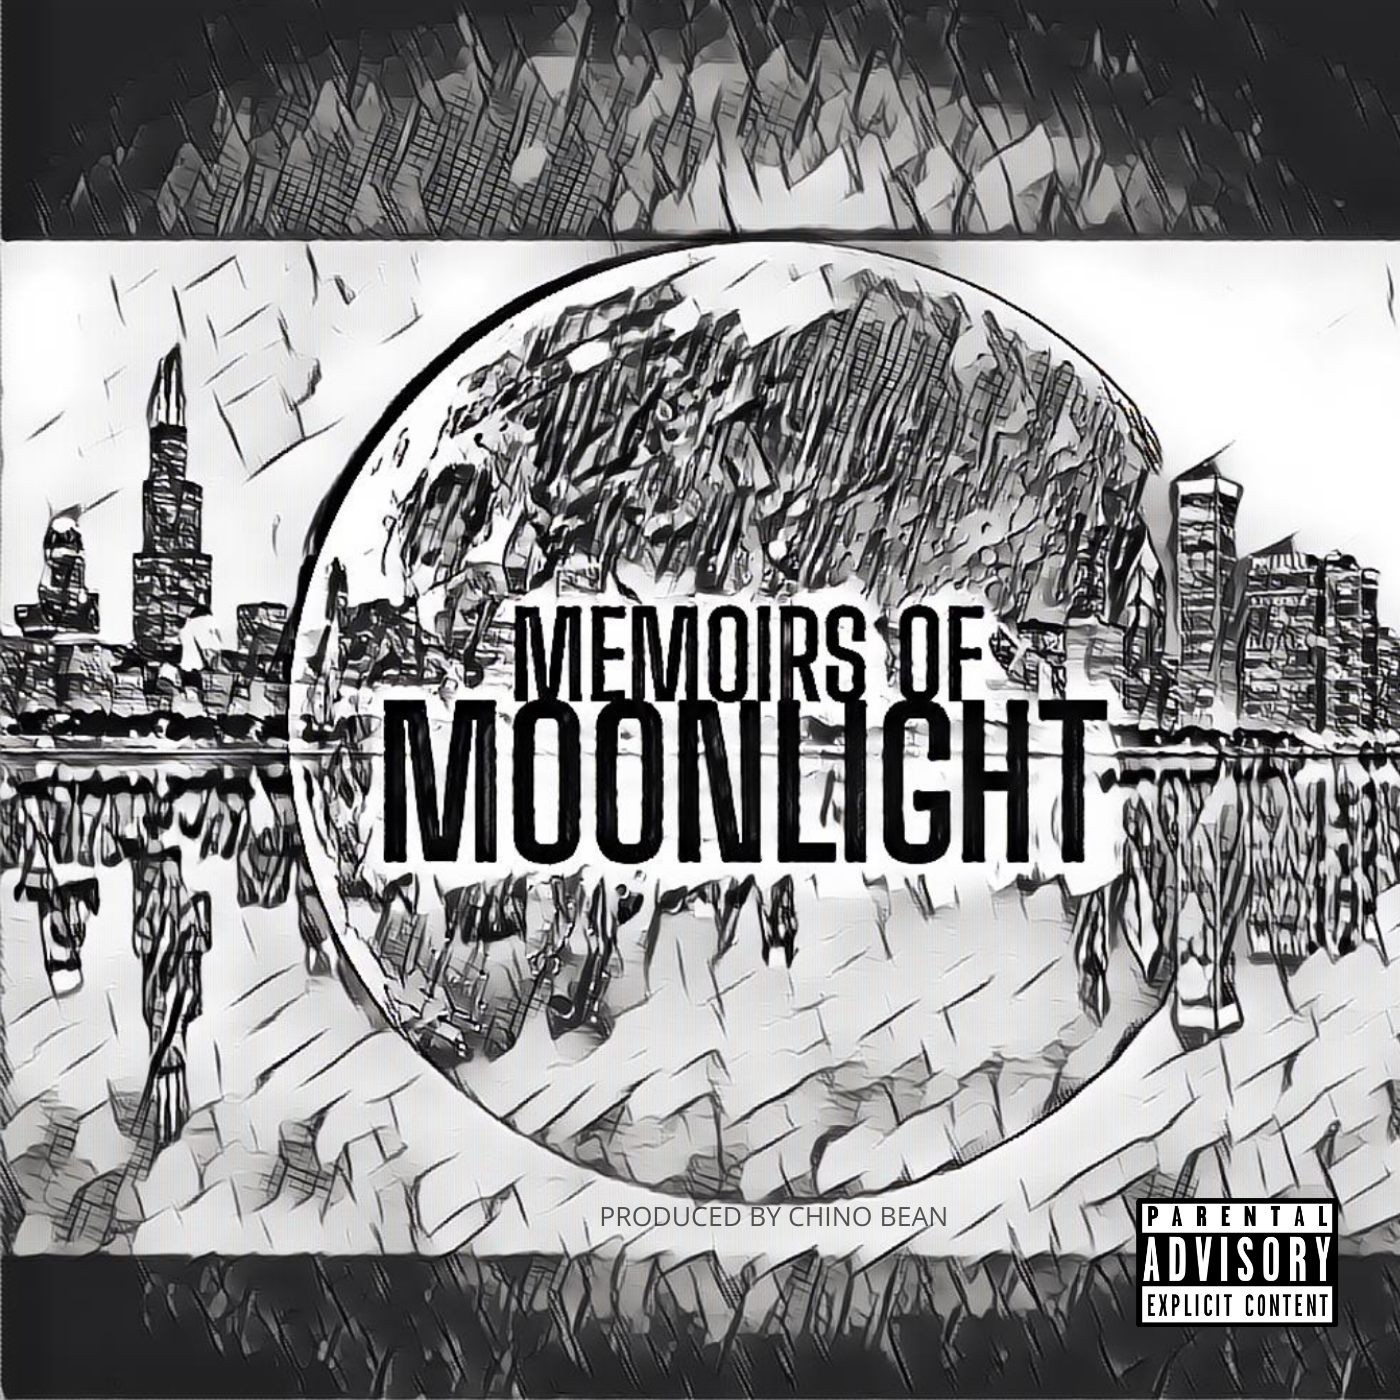 Memoirs Moonlight